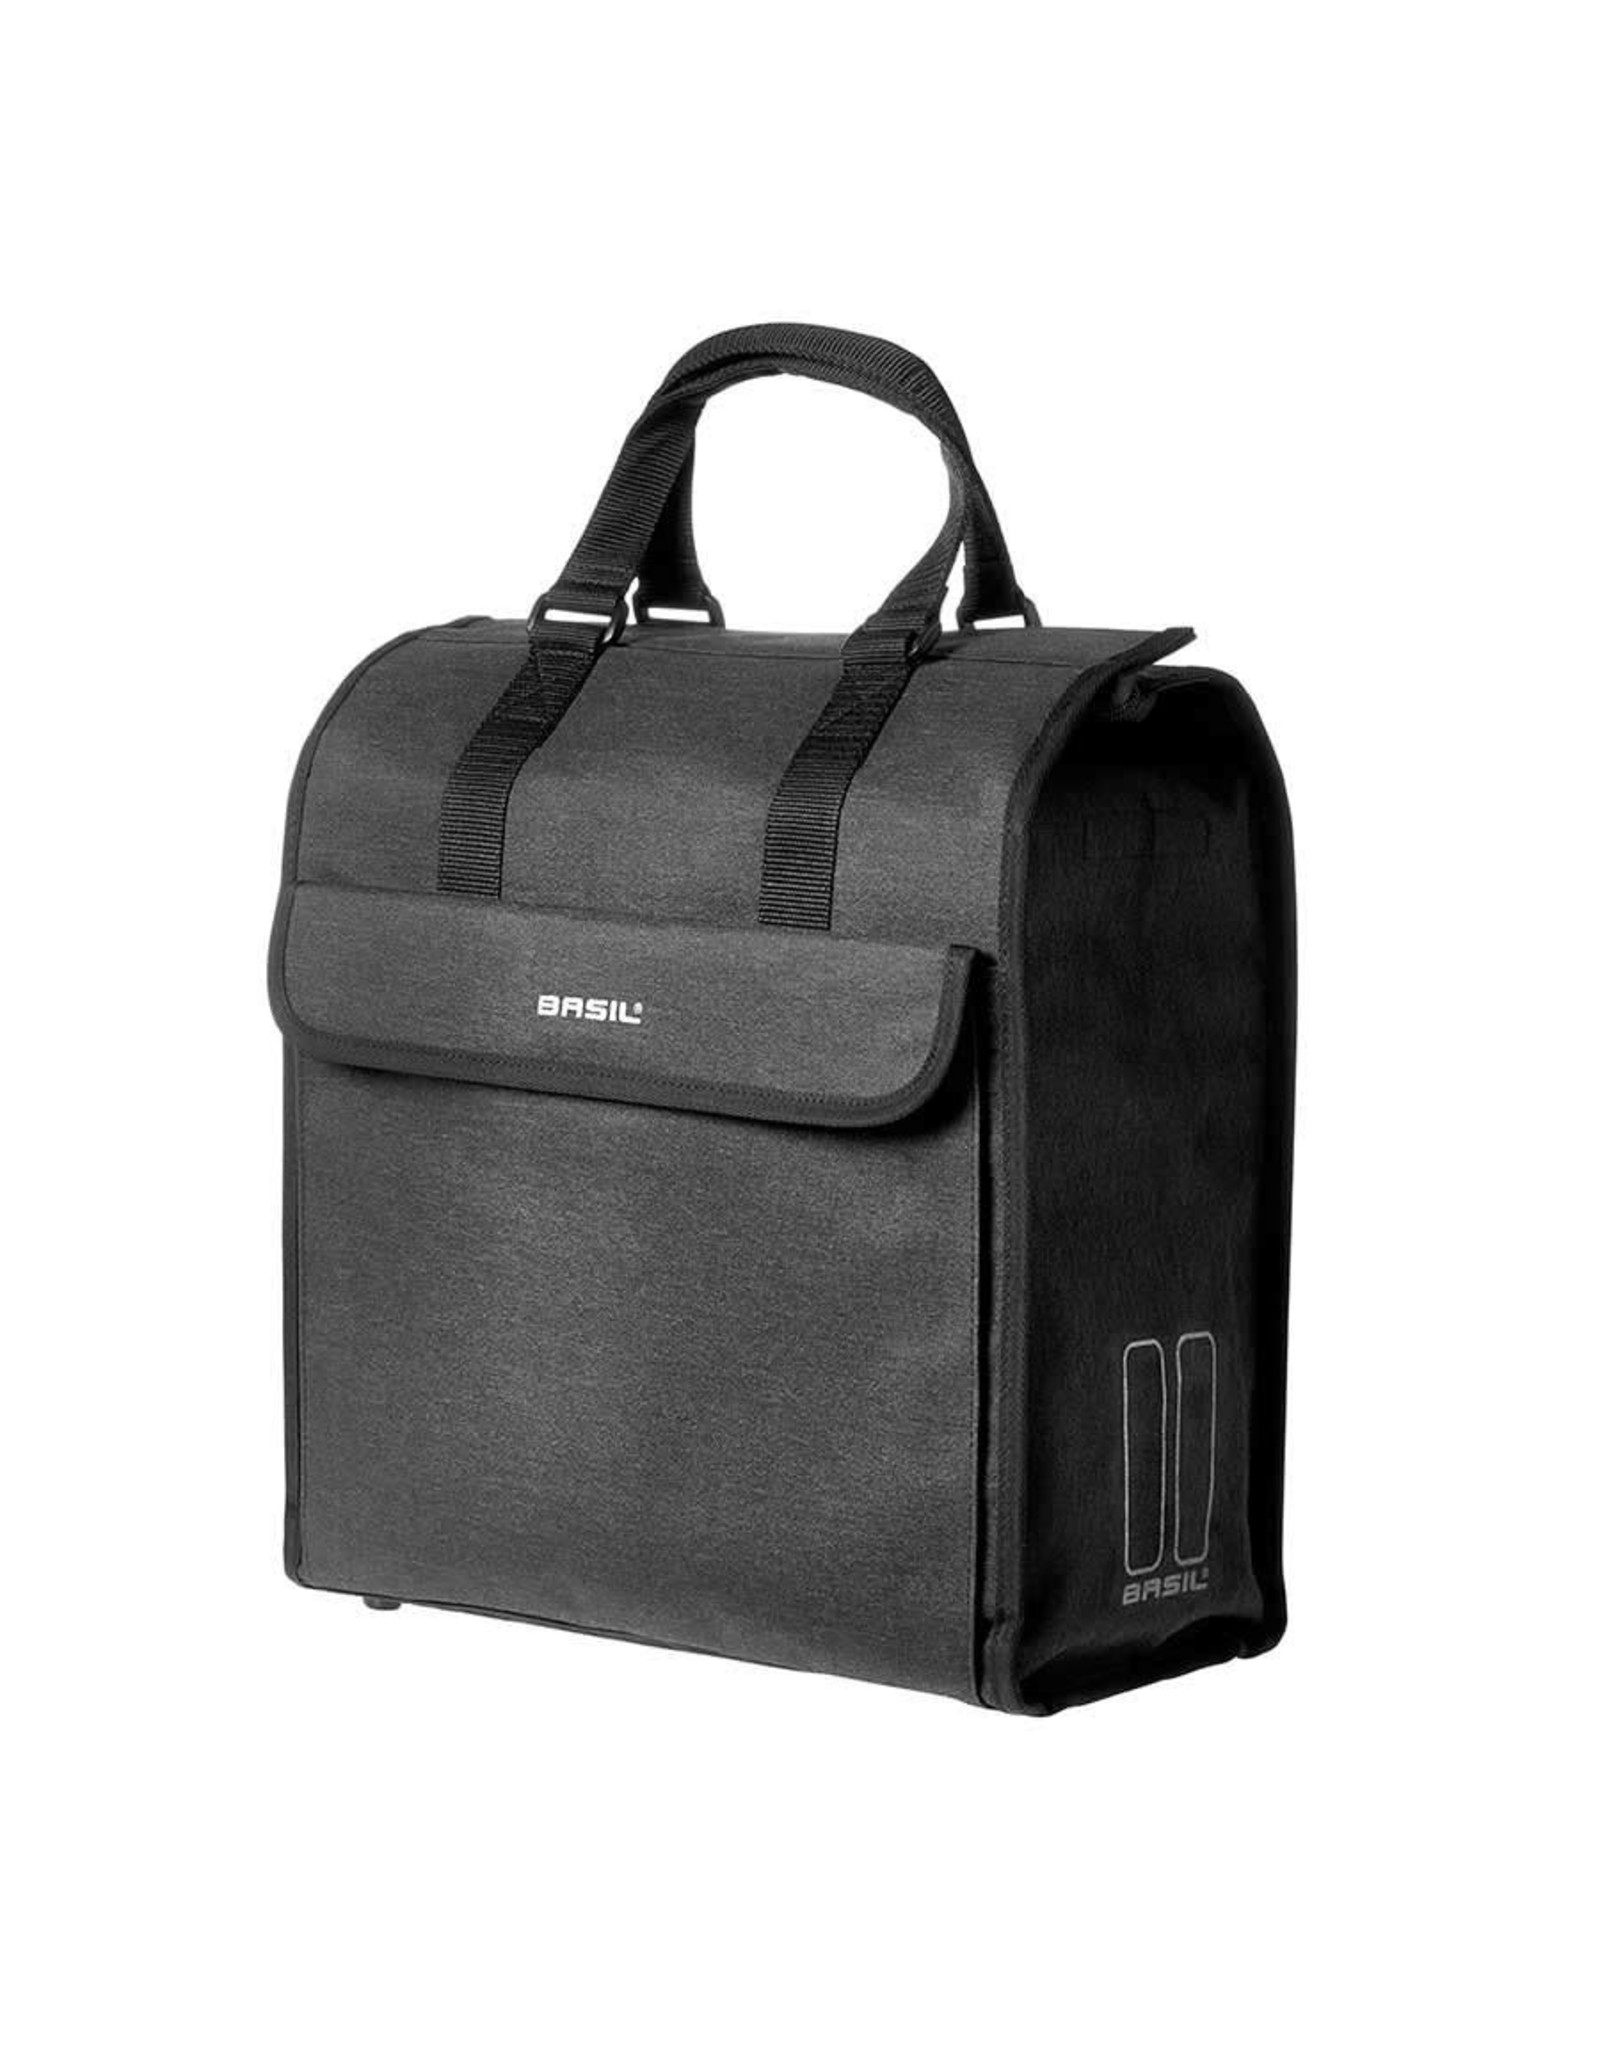 Basil BASIL, Mira Shopping Bag, Black